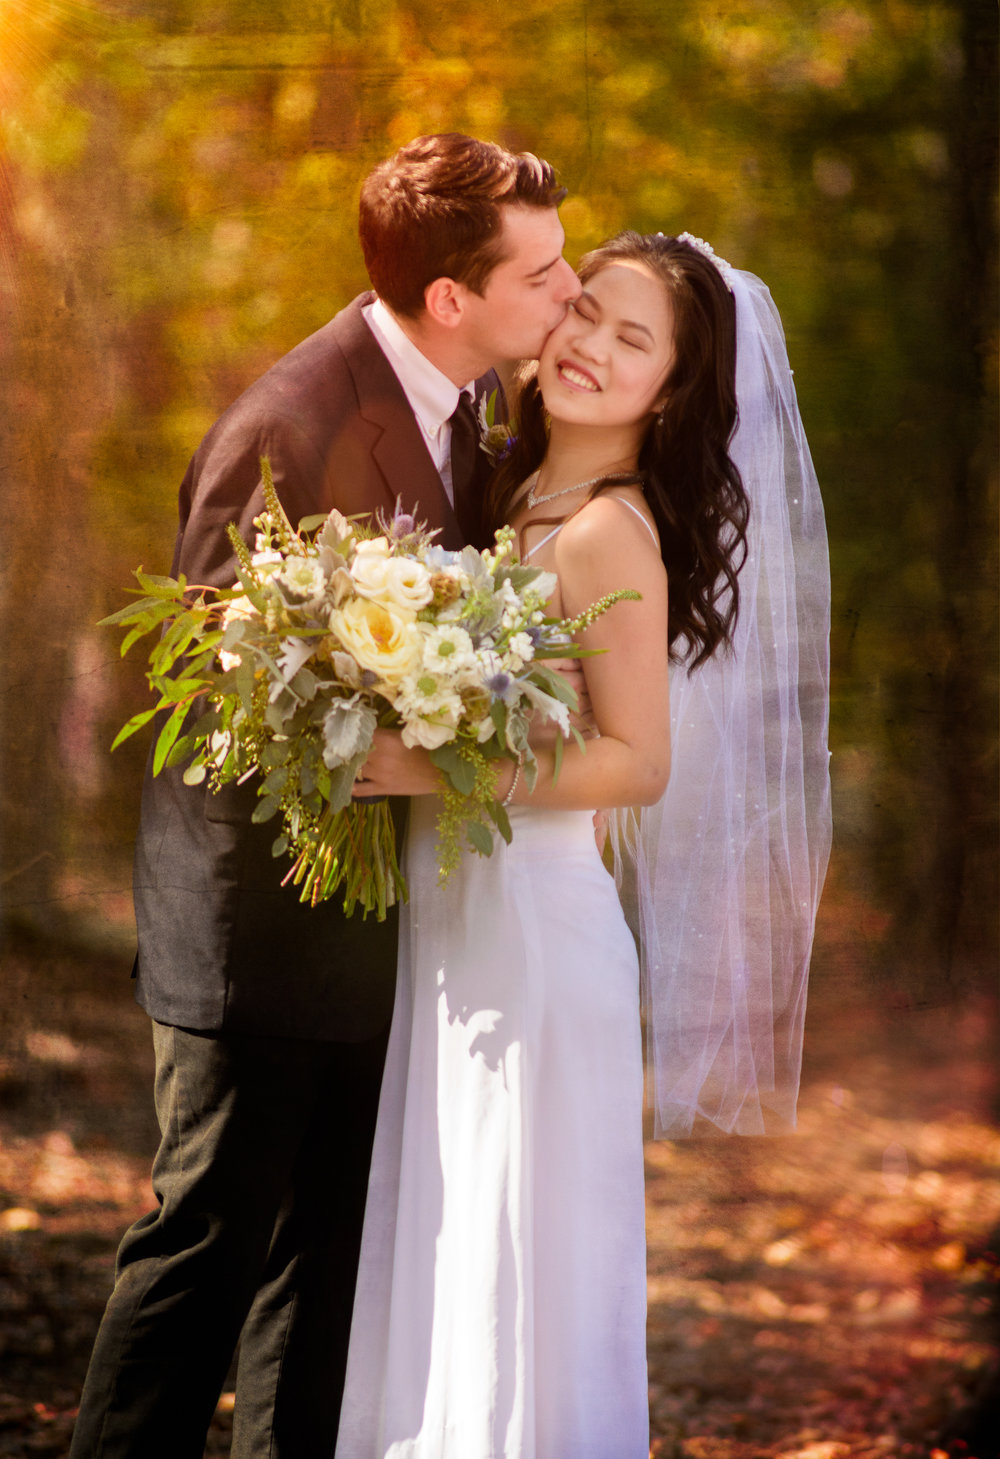 wedding_portrait-4.jpg